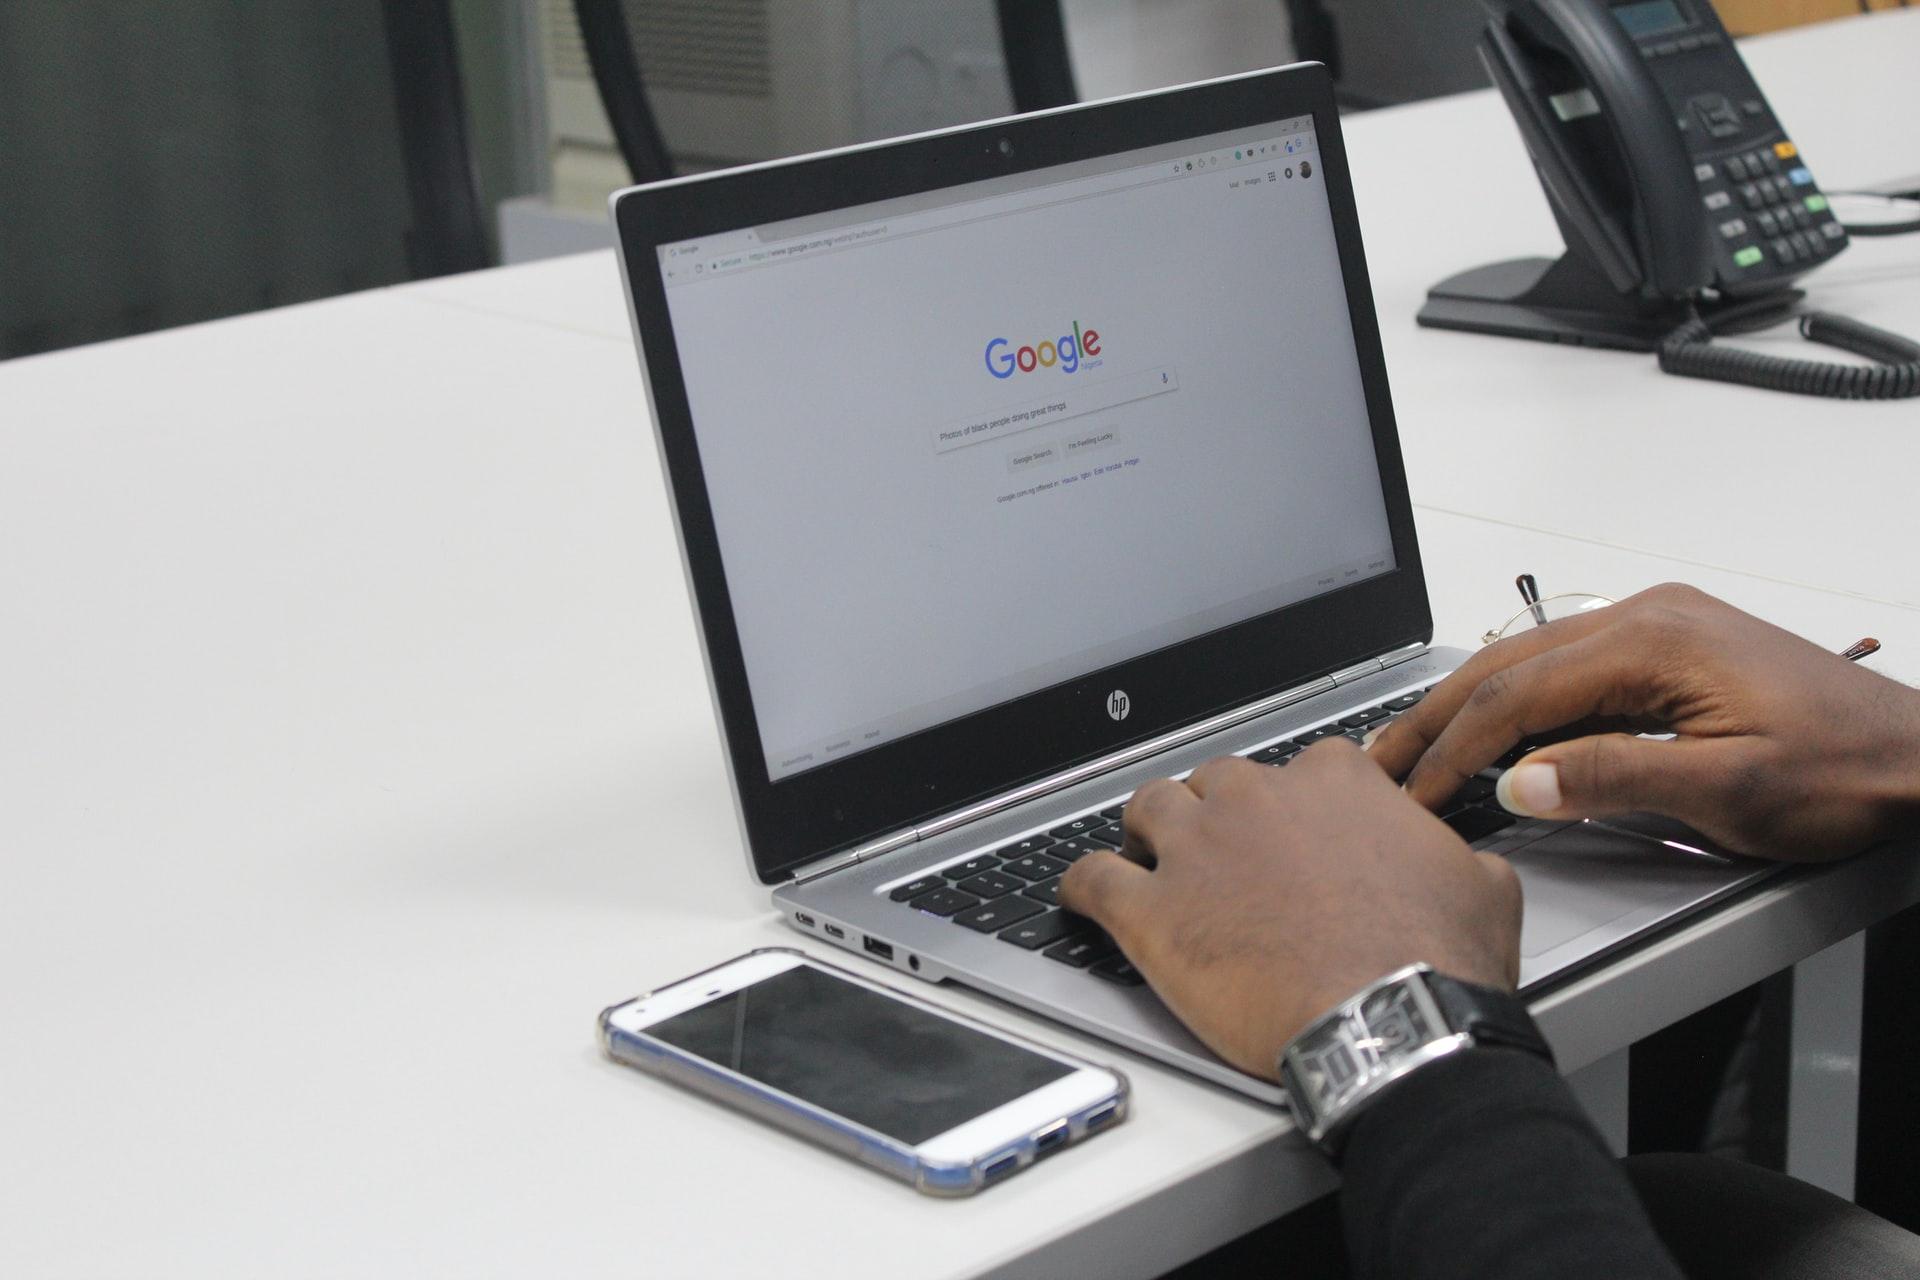 5 Manfaat Kerjasama dengan Digital Marketing Agency bagi Pelaku UMKM